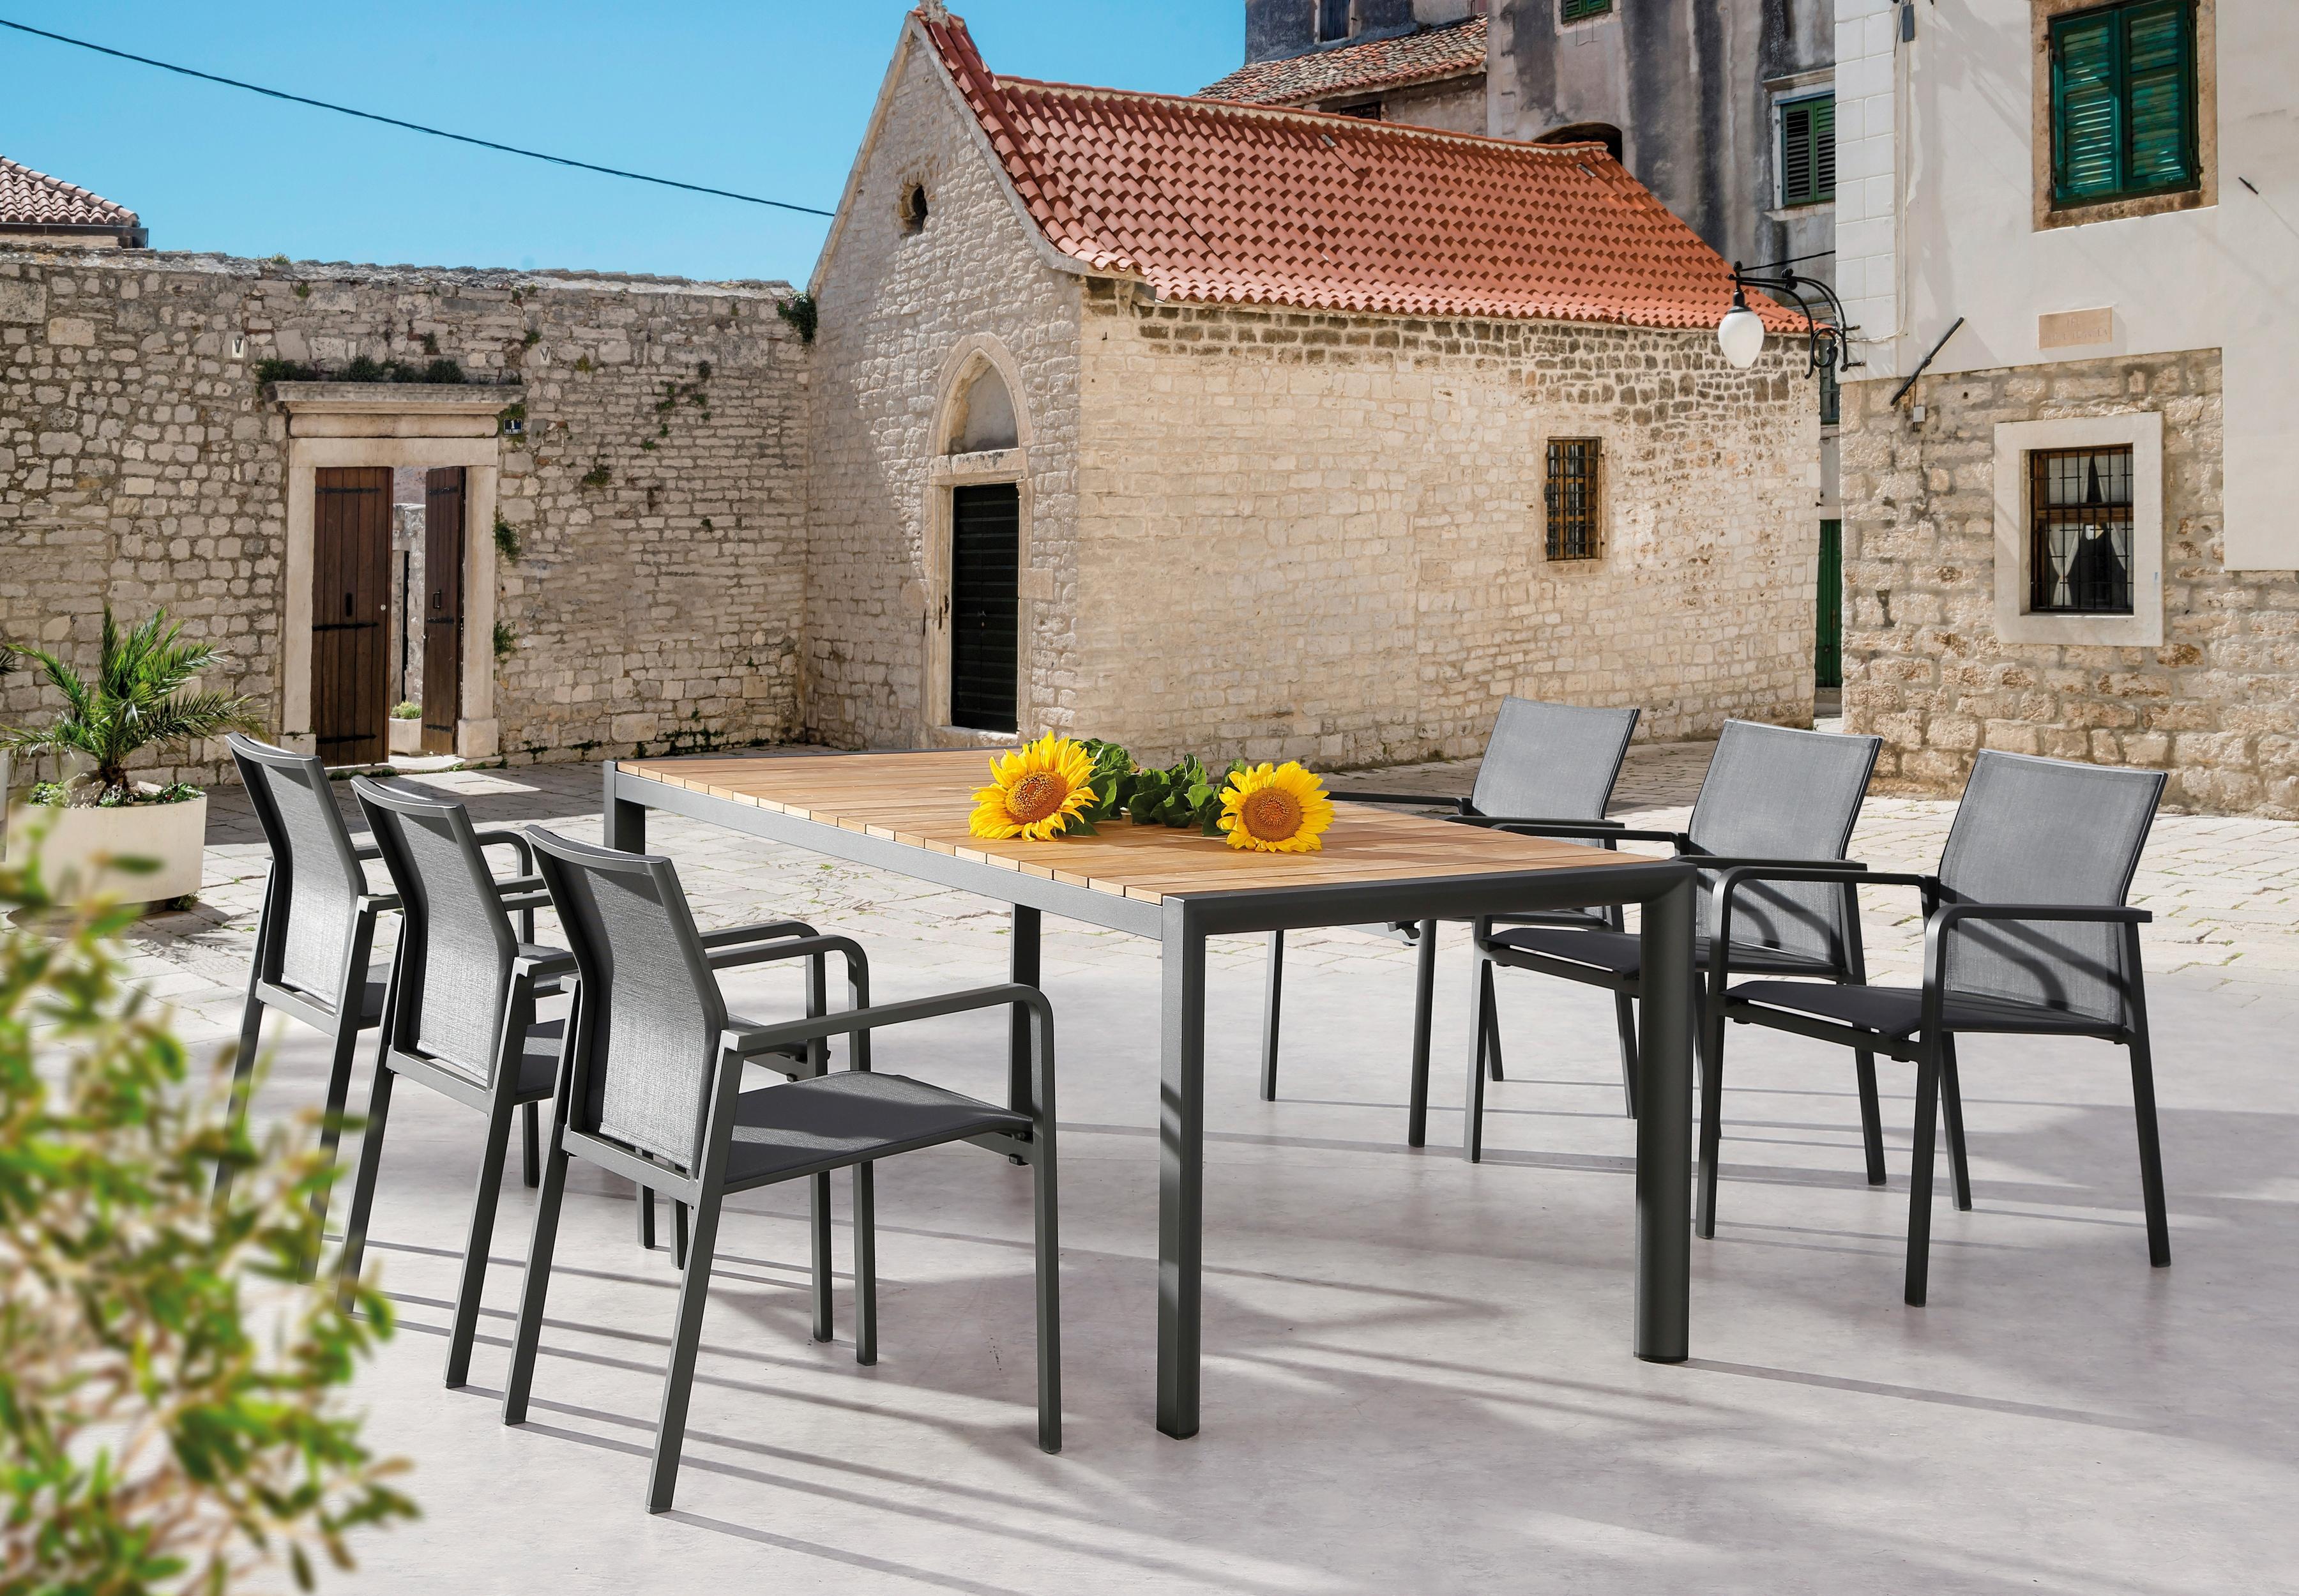 BEST Gartenmöbelset Rhodos/Paros 7-tlg 6 Stapelsessel Tisch 210x90 cm Alu/Ergotex/Teak